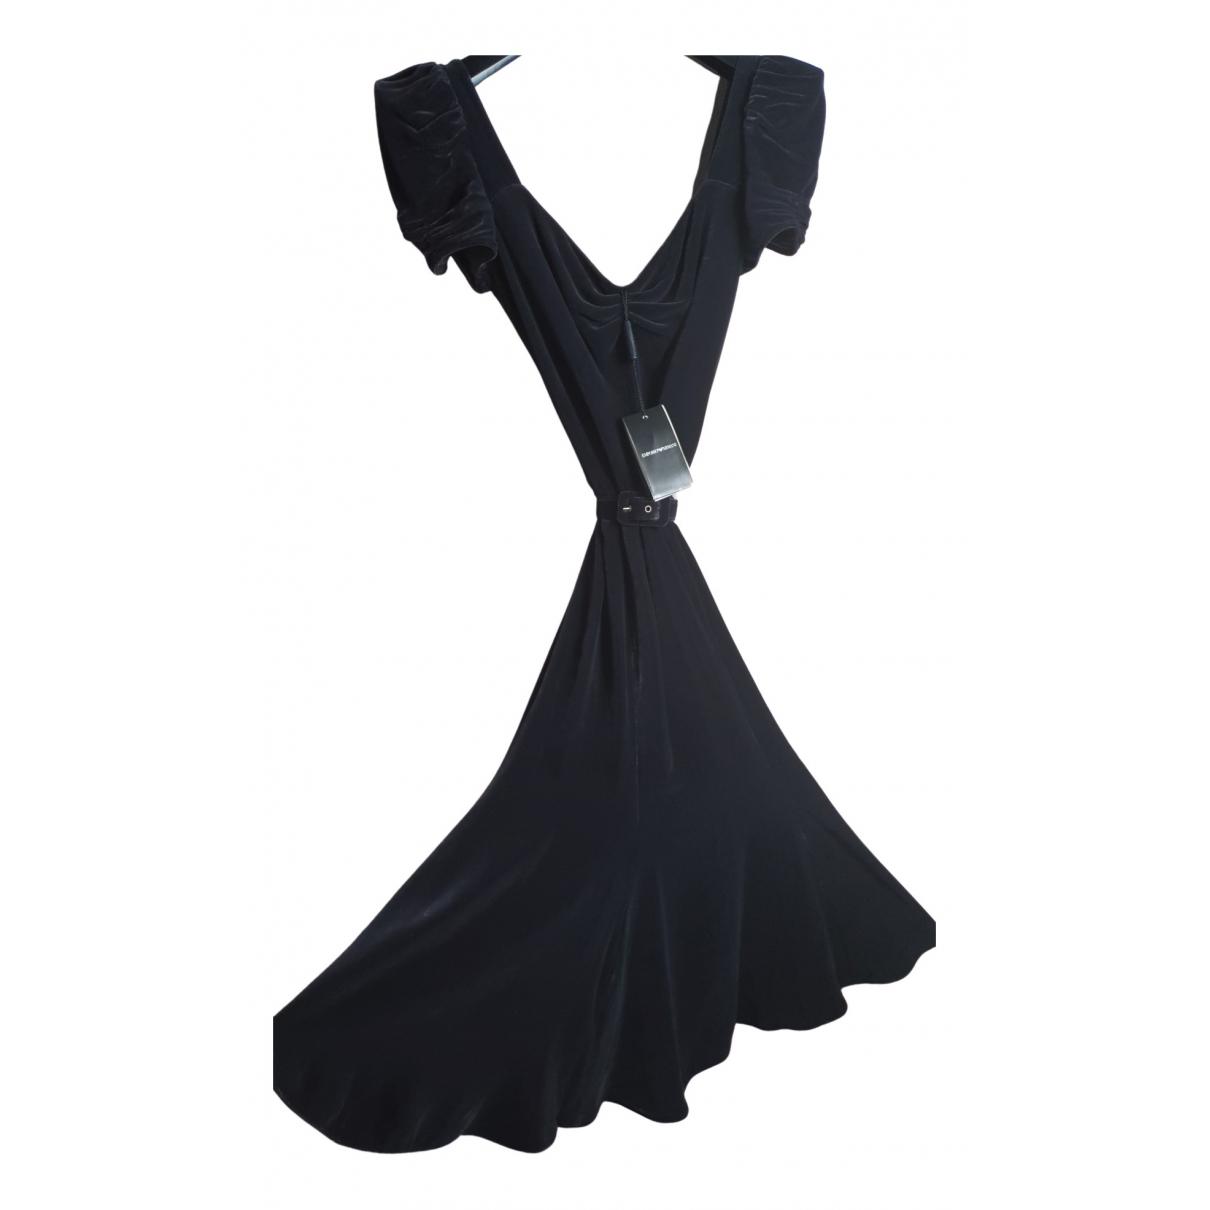 Emporio Armani \N Kleid in  Braun Viskose